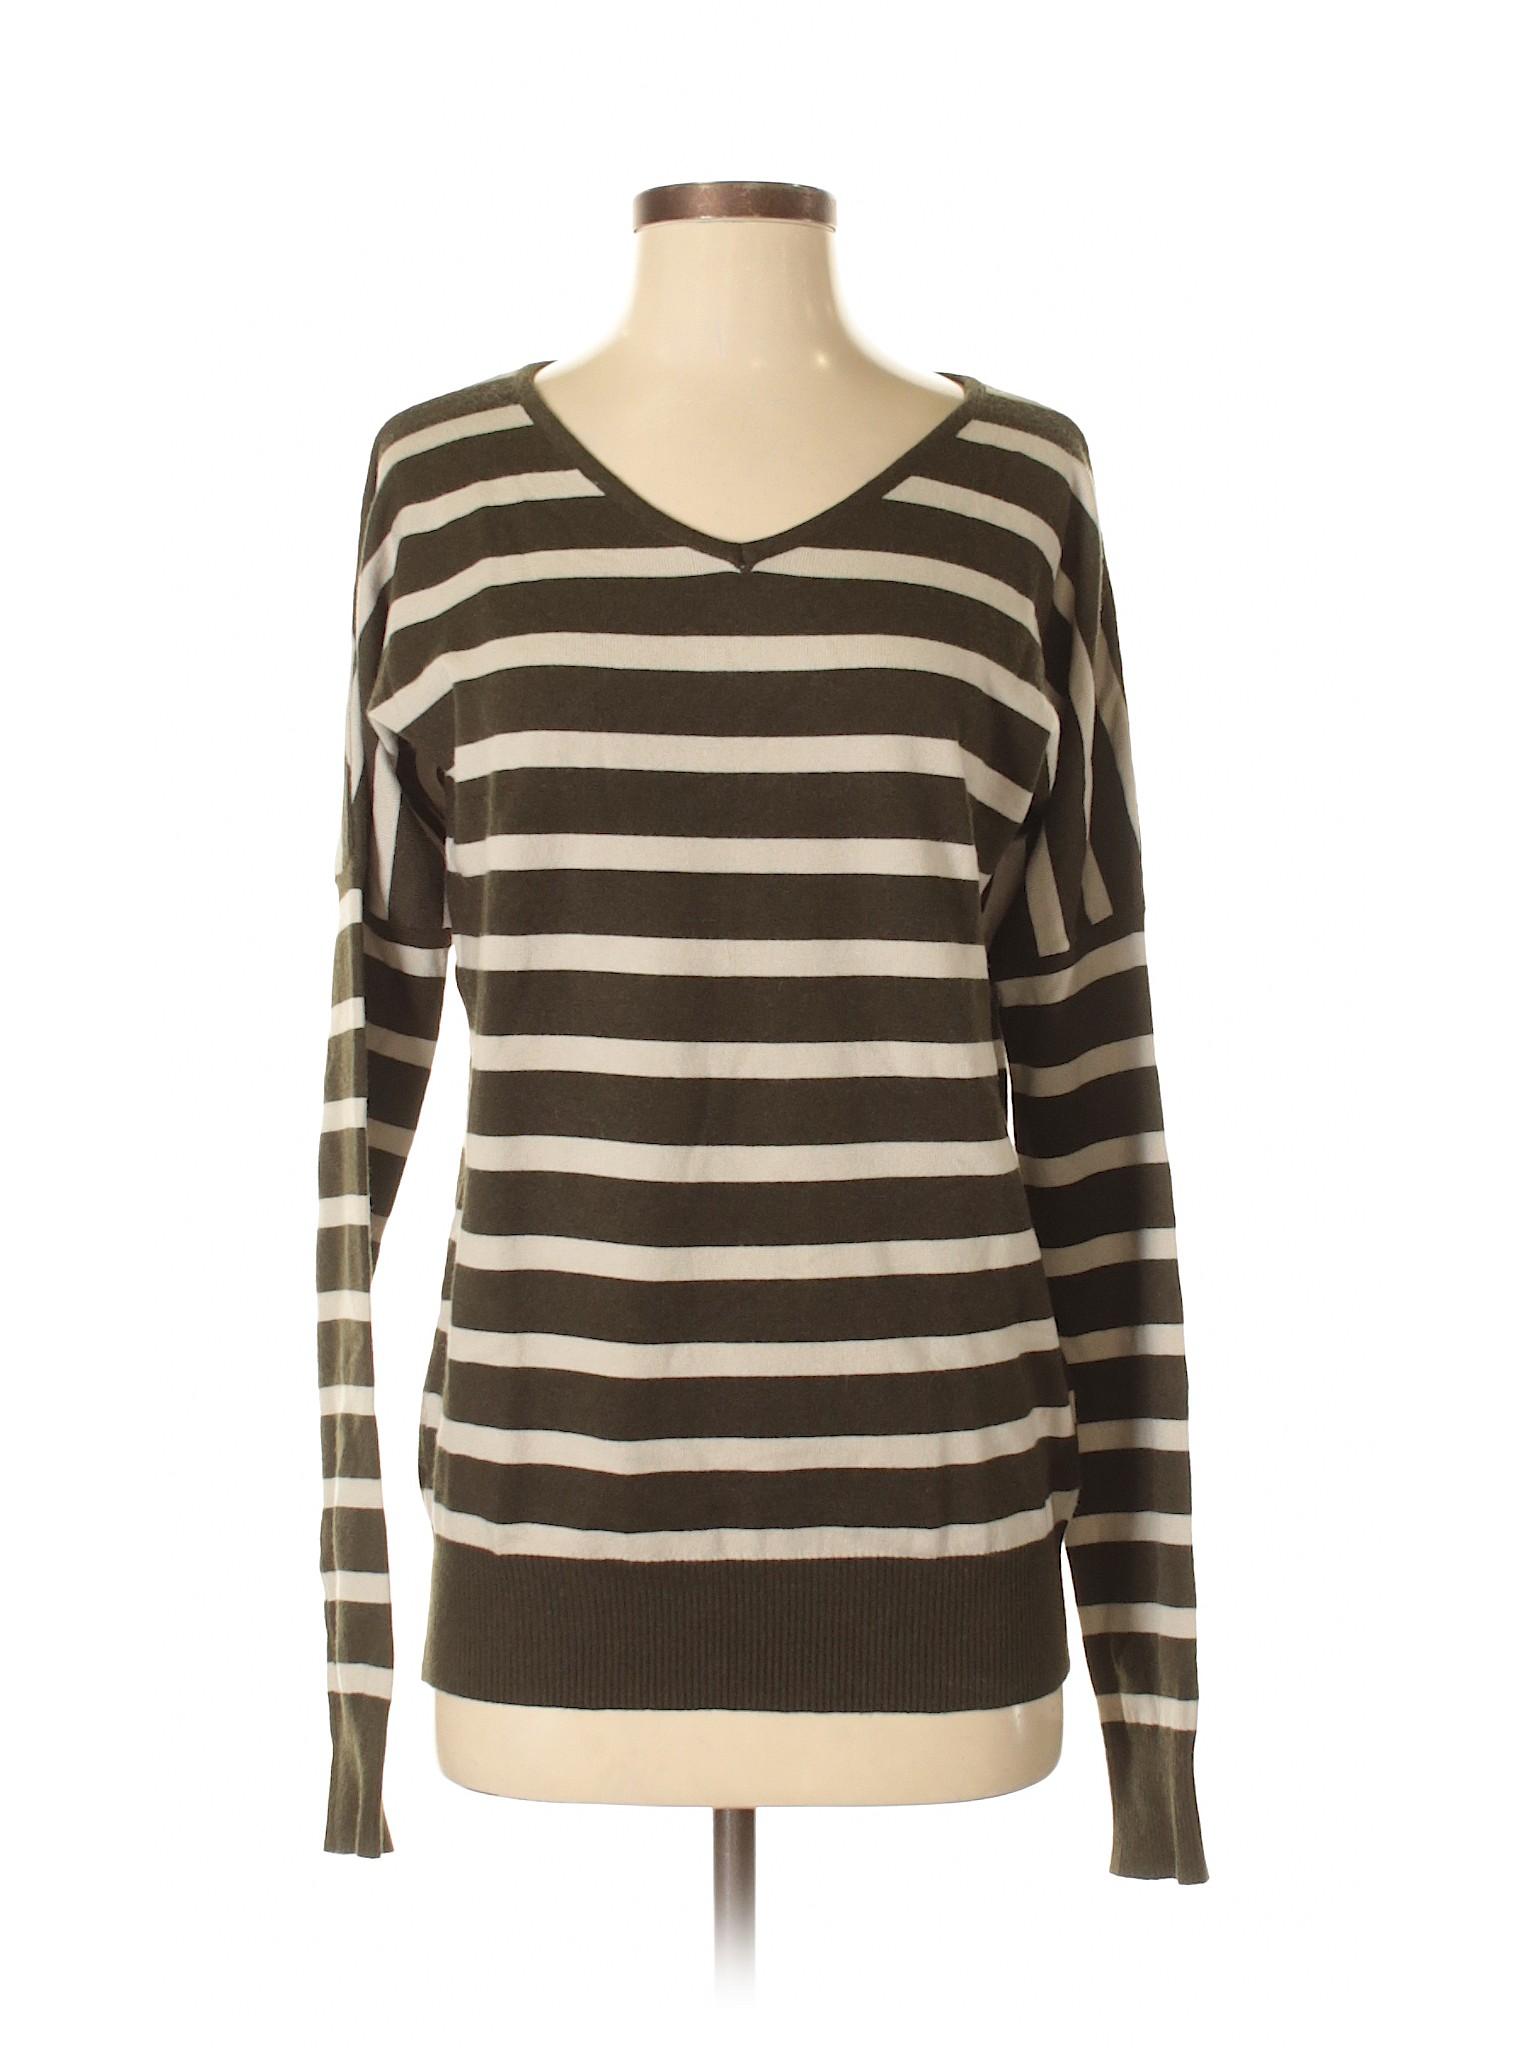 Boutique Pixley Boutique winter Pullover Sweater winter aqU6Y4R